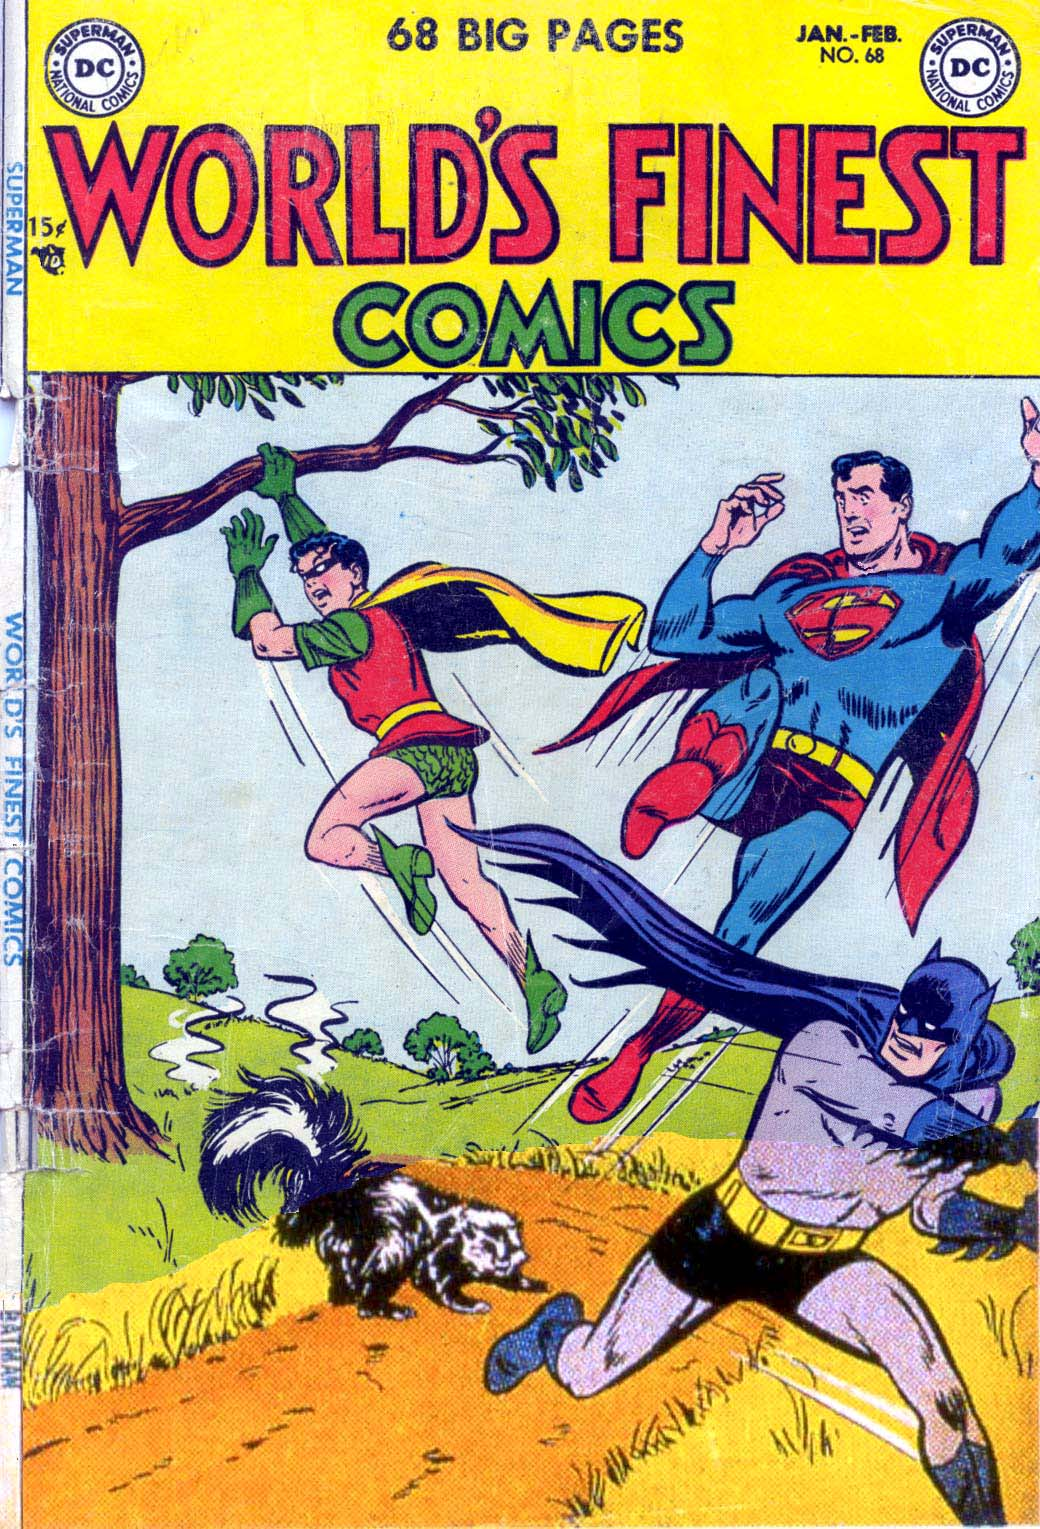 Read online World's Finest Comics comic -  Issue #68 - 1